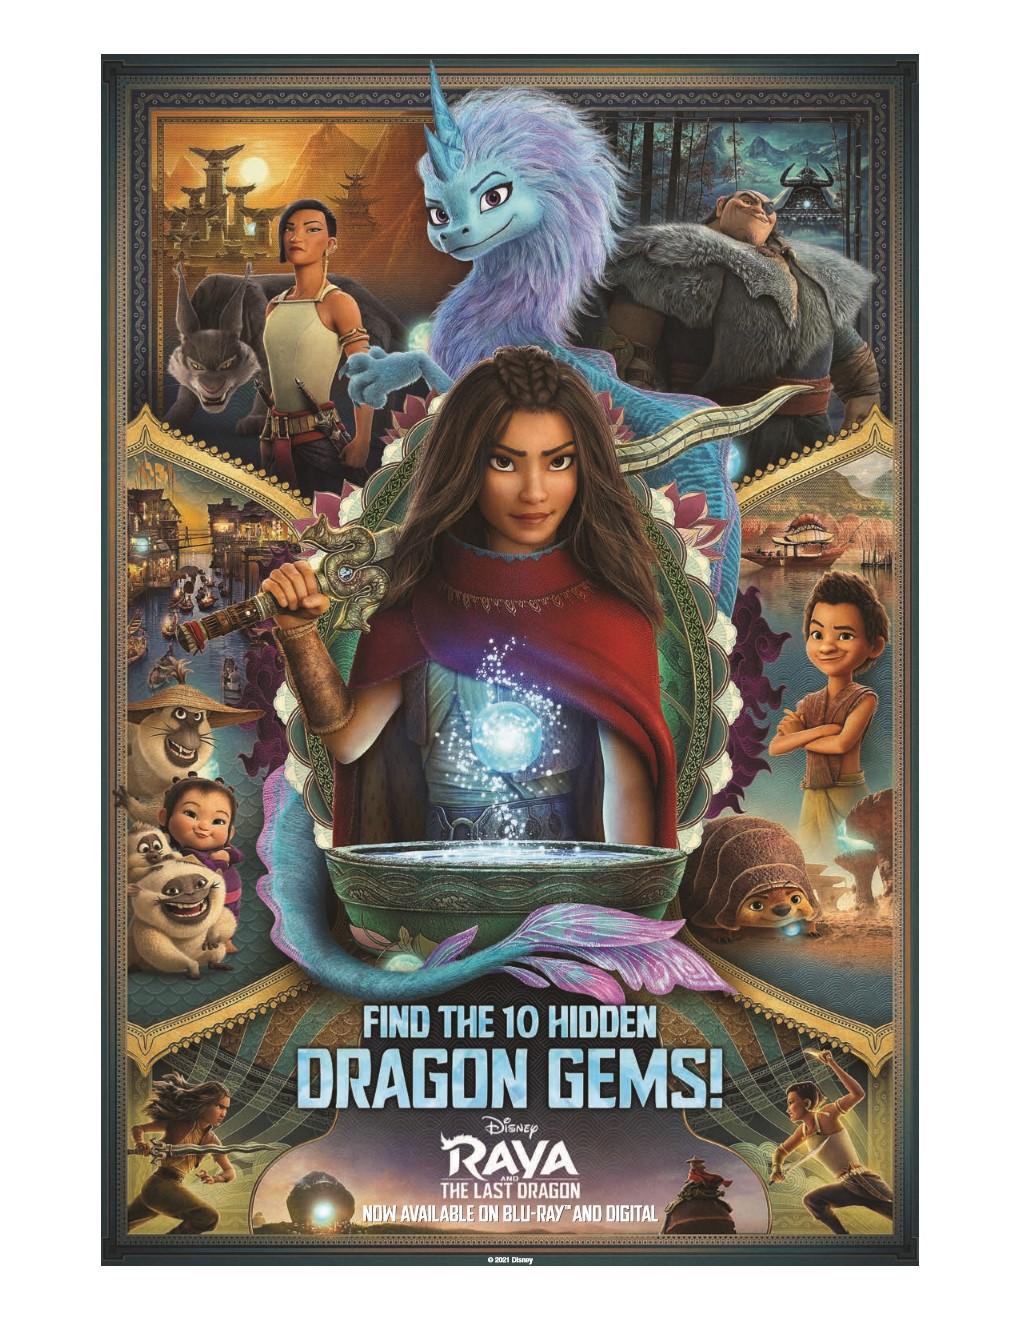 Raya and the Last Dragon: Free #Printables and #Giveaway! #DisneyRaya